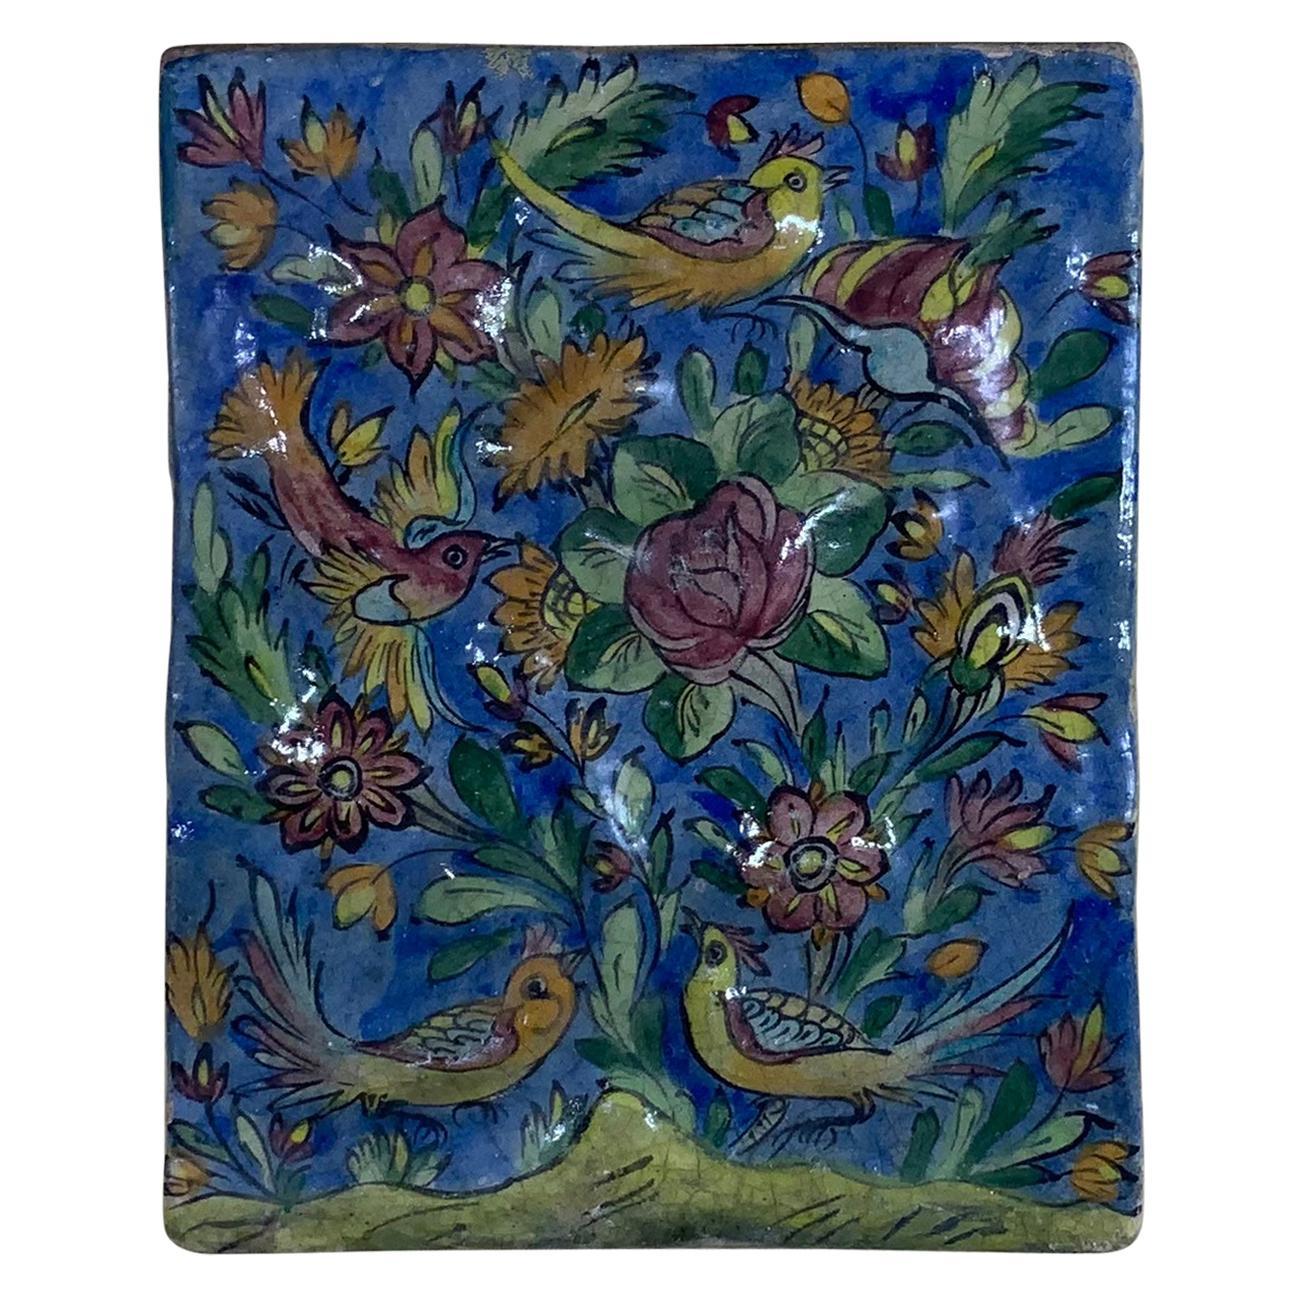 Vintage Ceramic Tile Wall Hanging